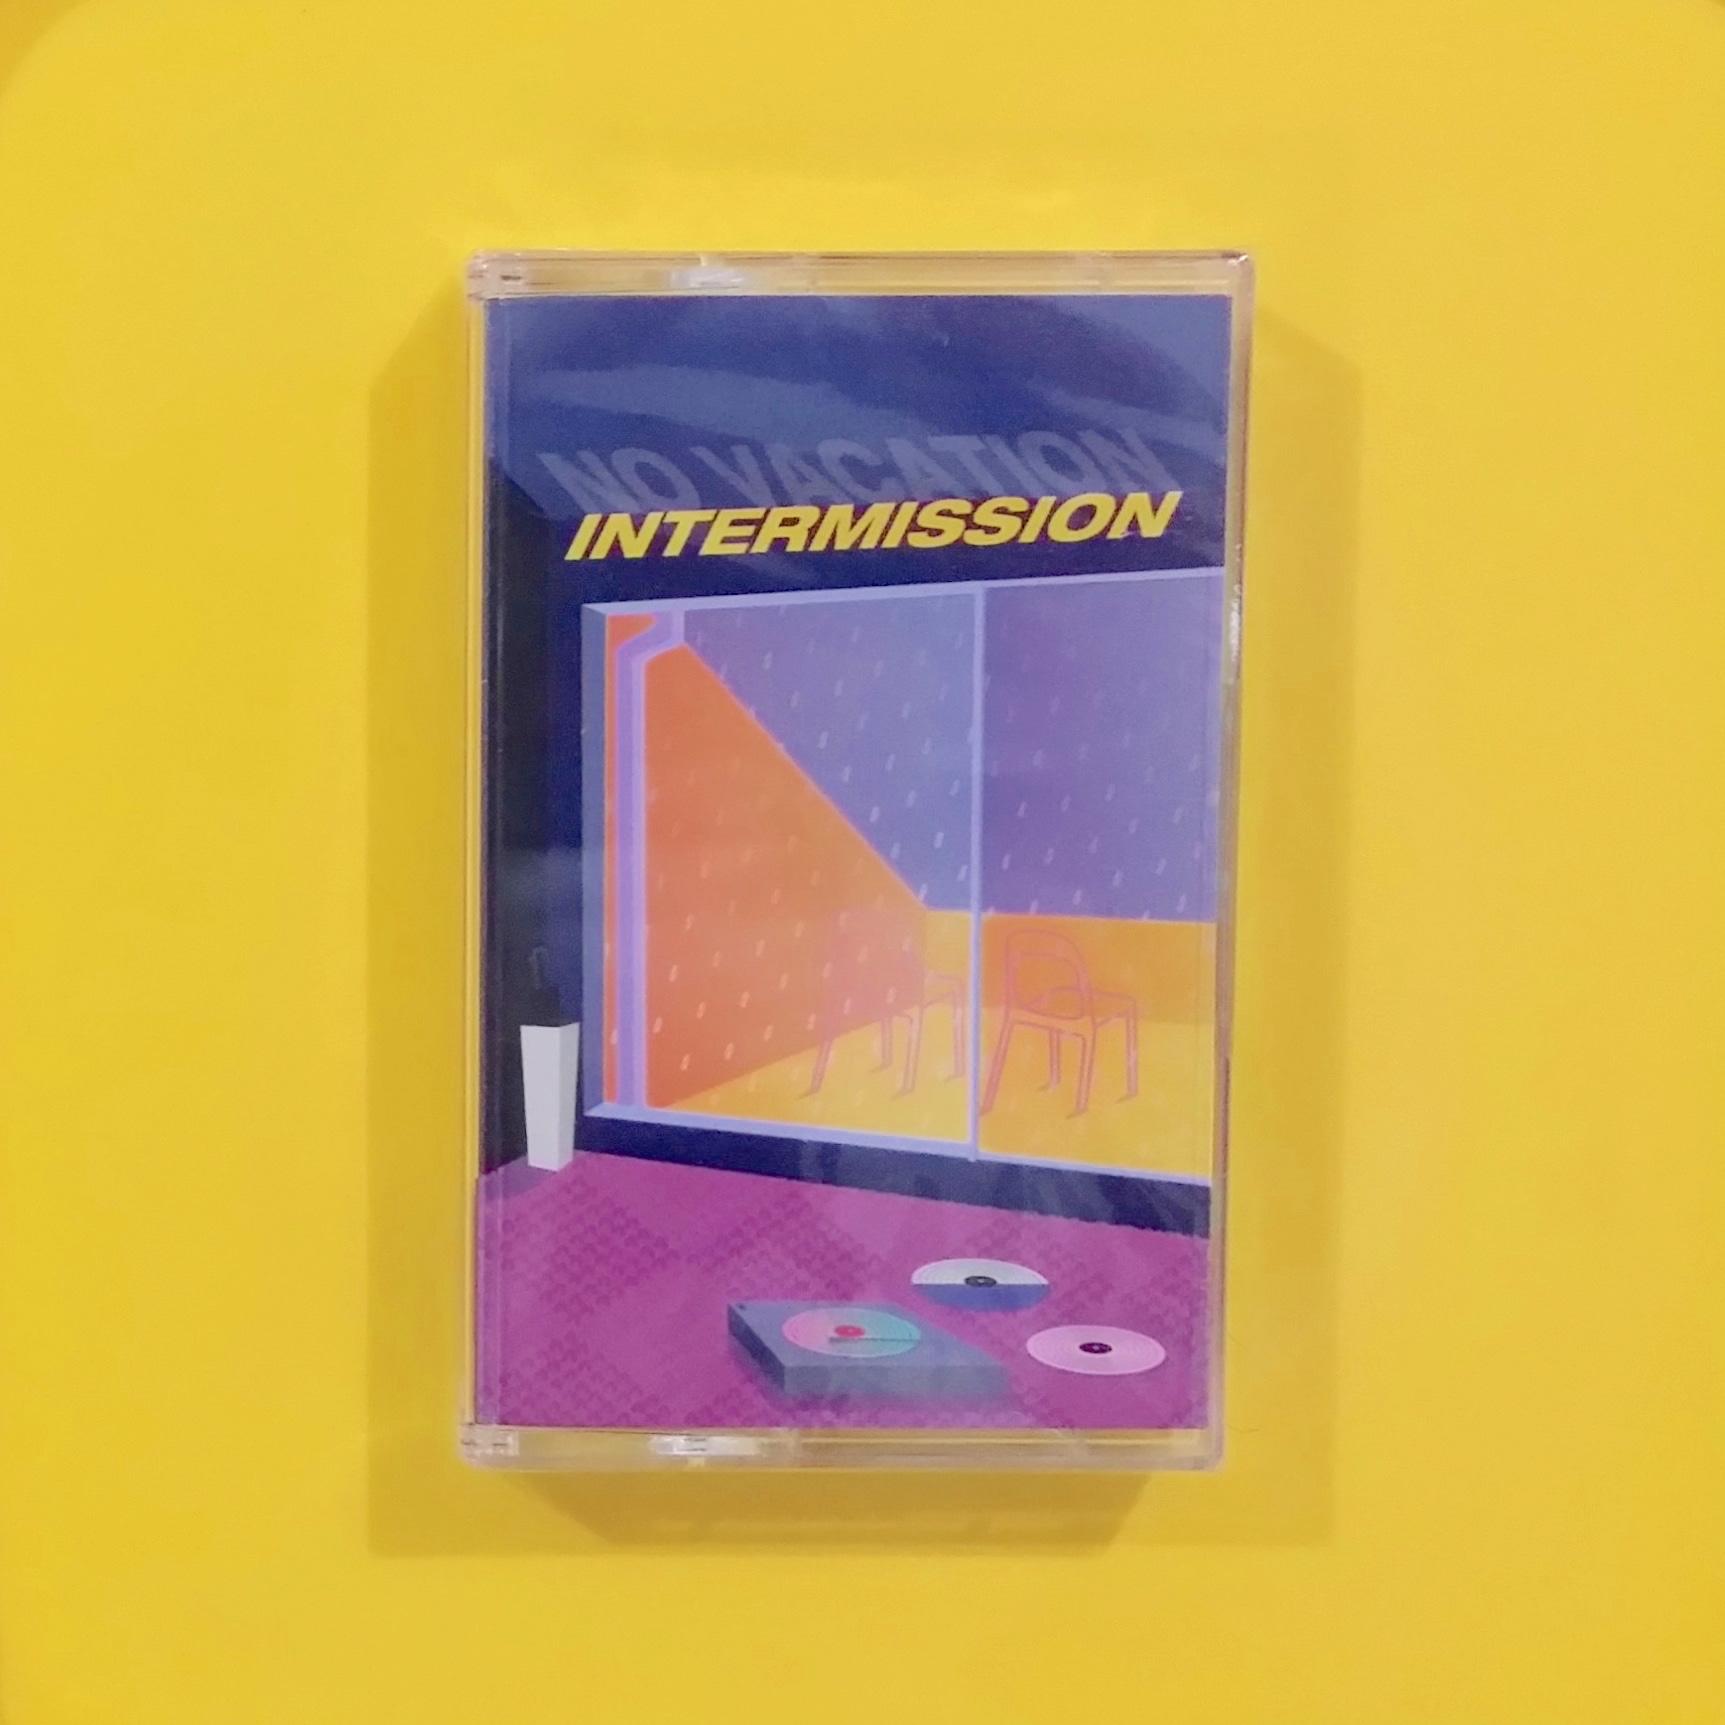 [SOLD] No Vacation - Intermission (Topshelf Records)